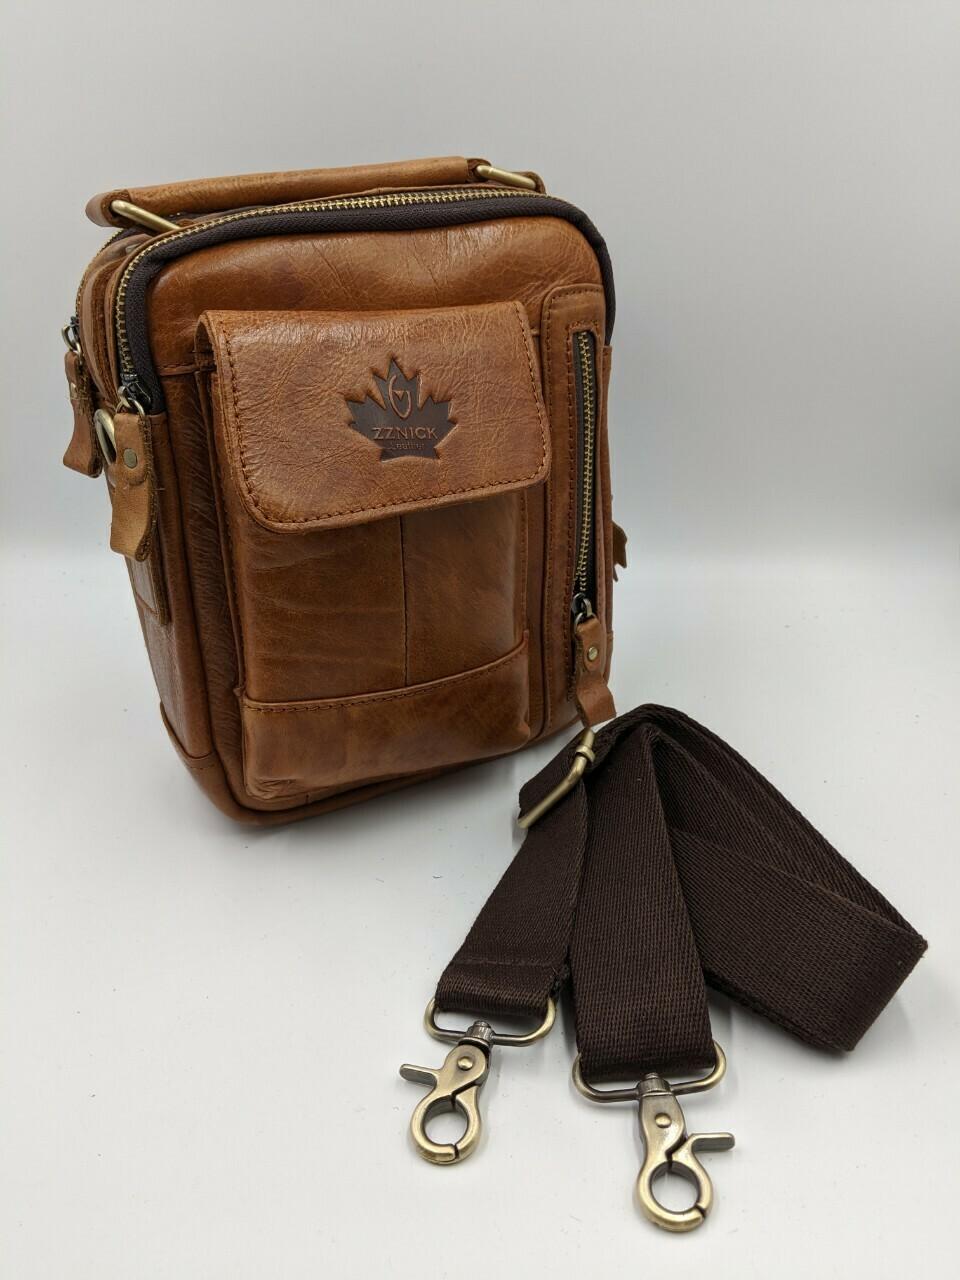 Мужская кожаная сумка zznick 65016